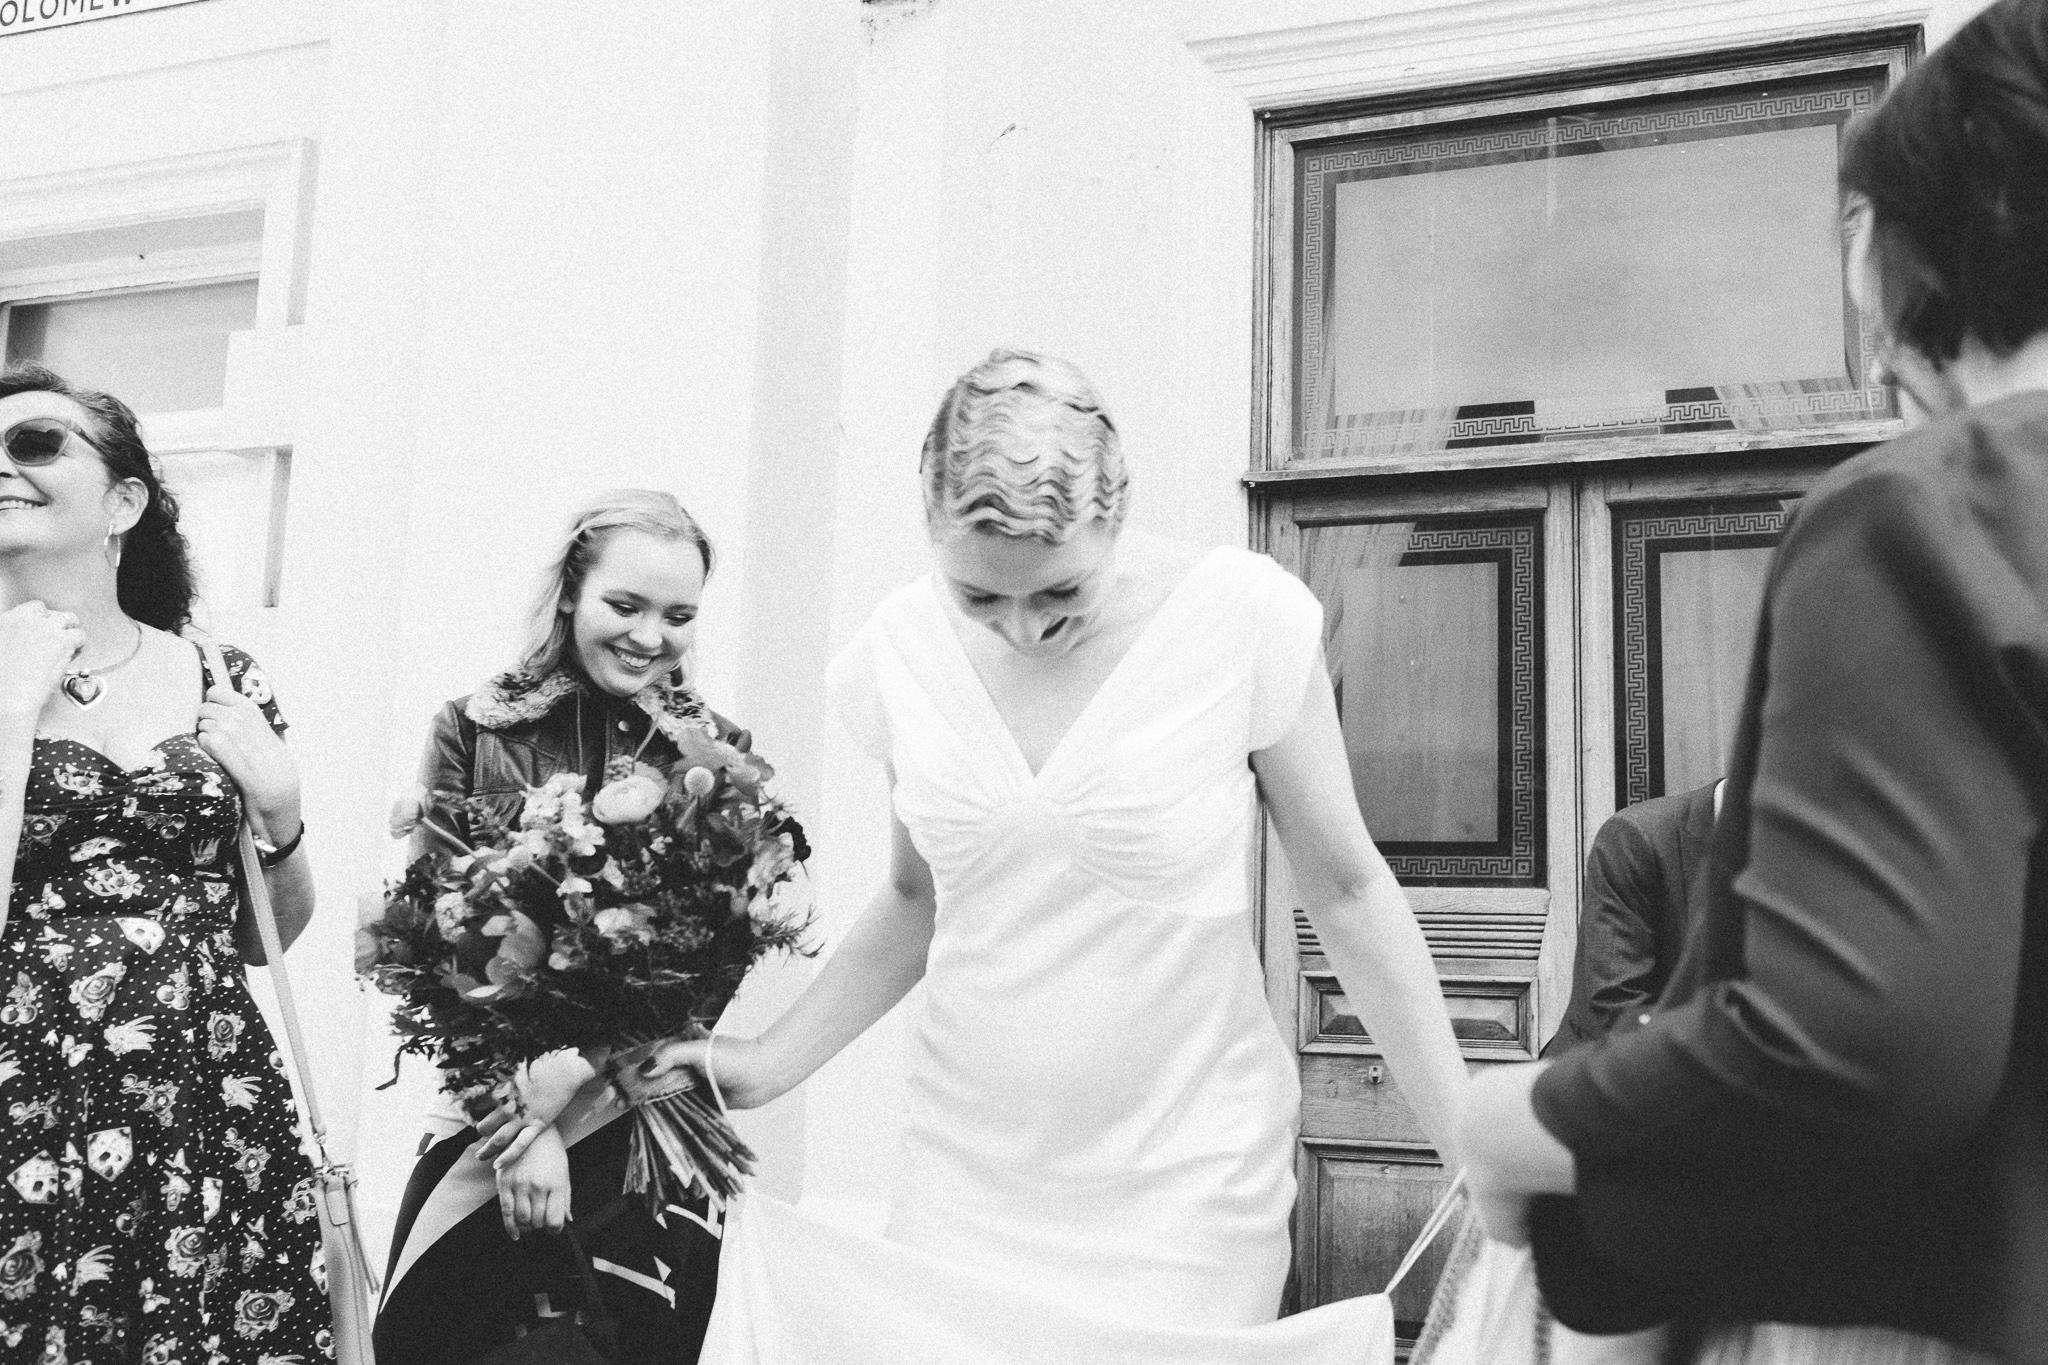 short_coverage_wedding_photographer_brighton_015.jpg